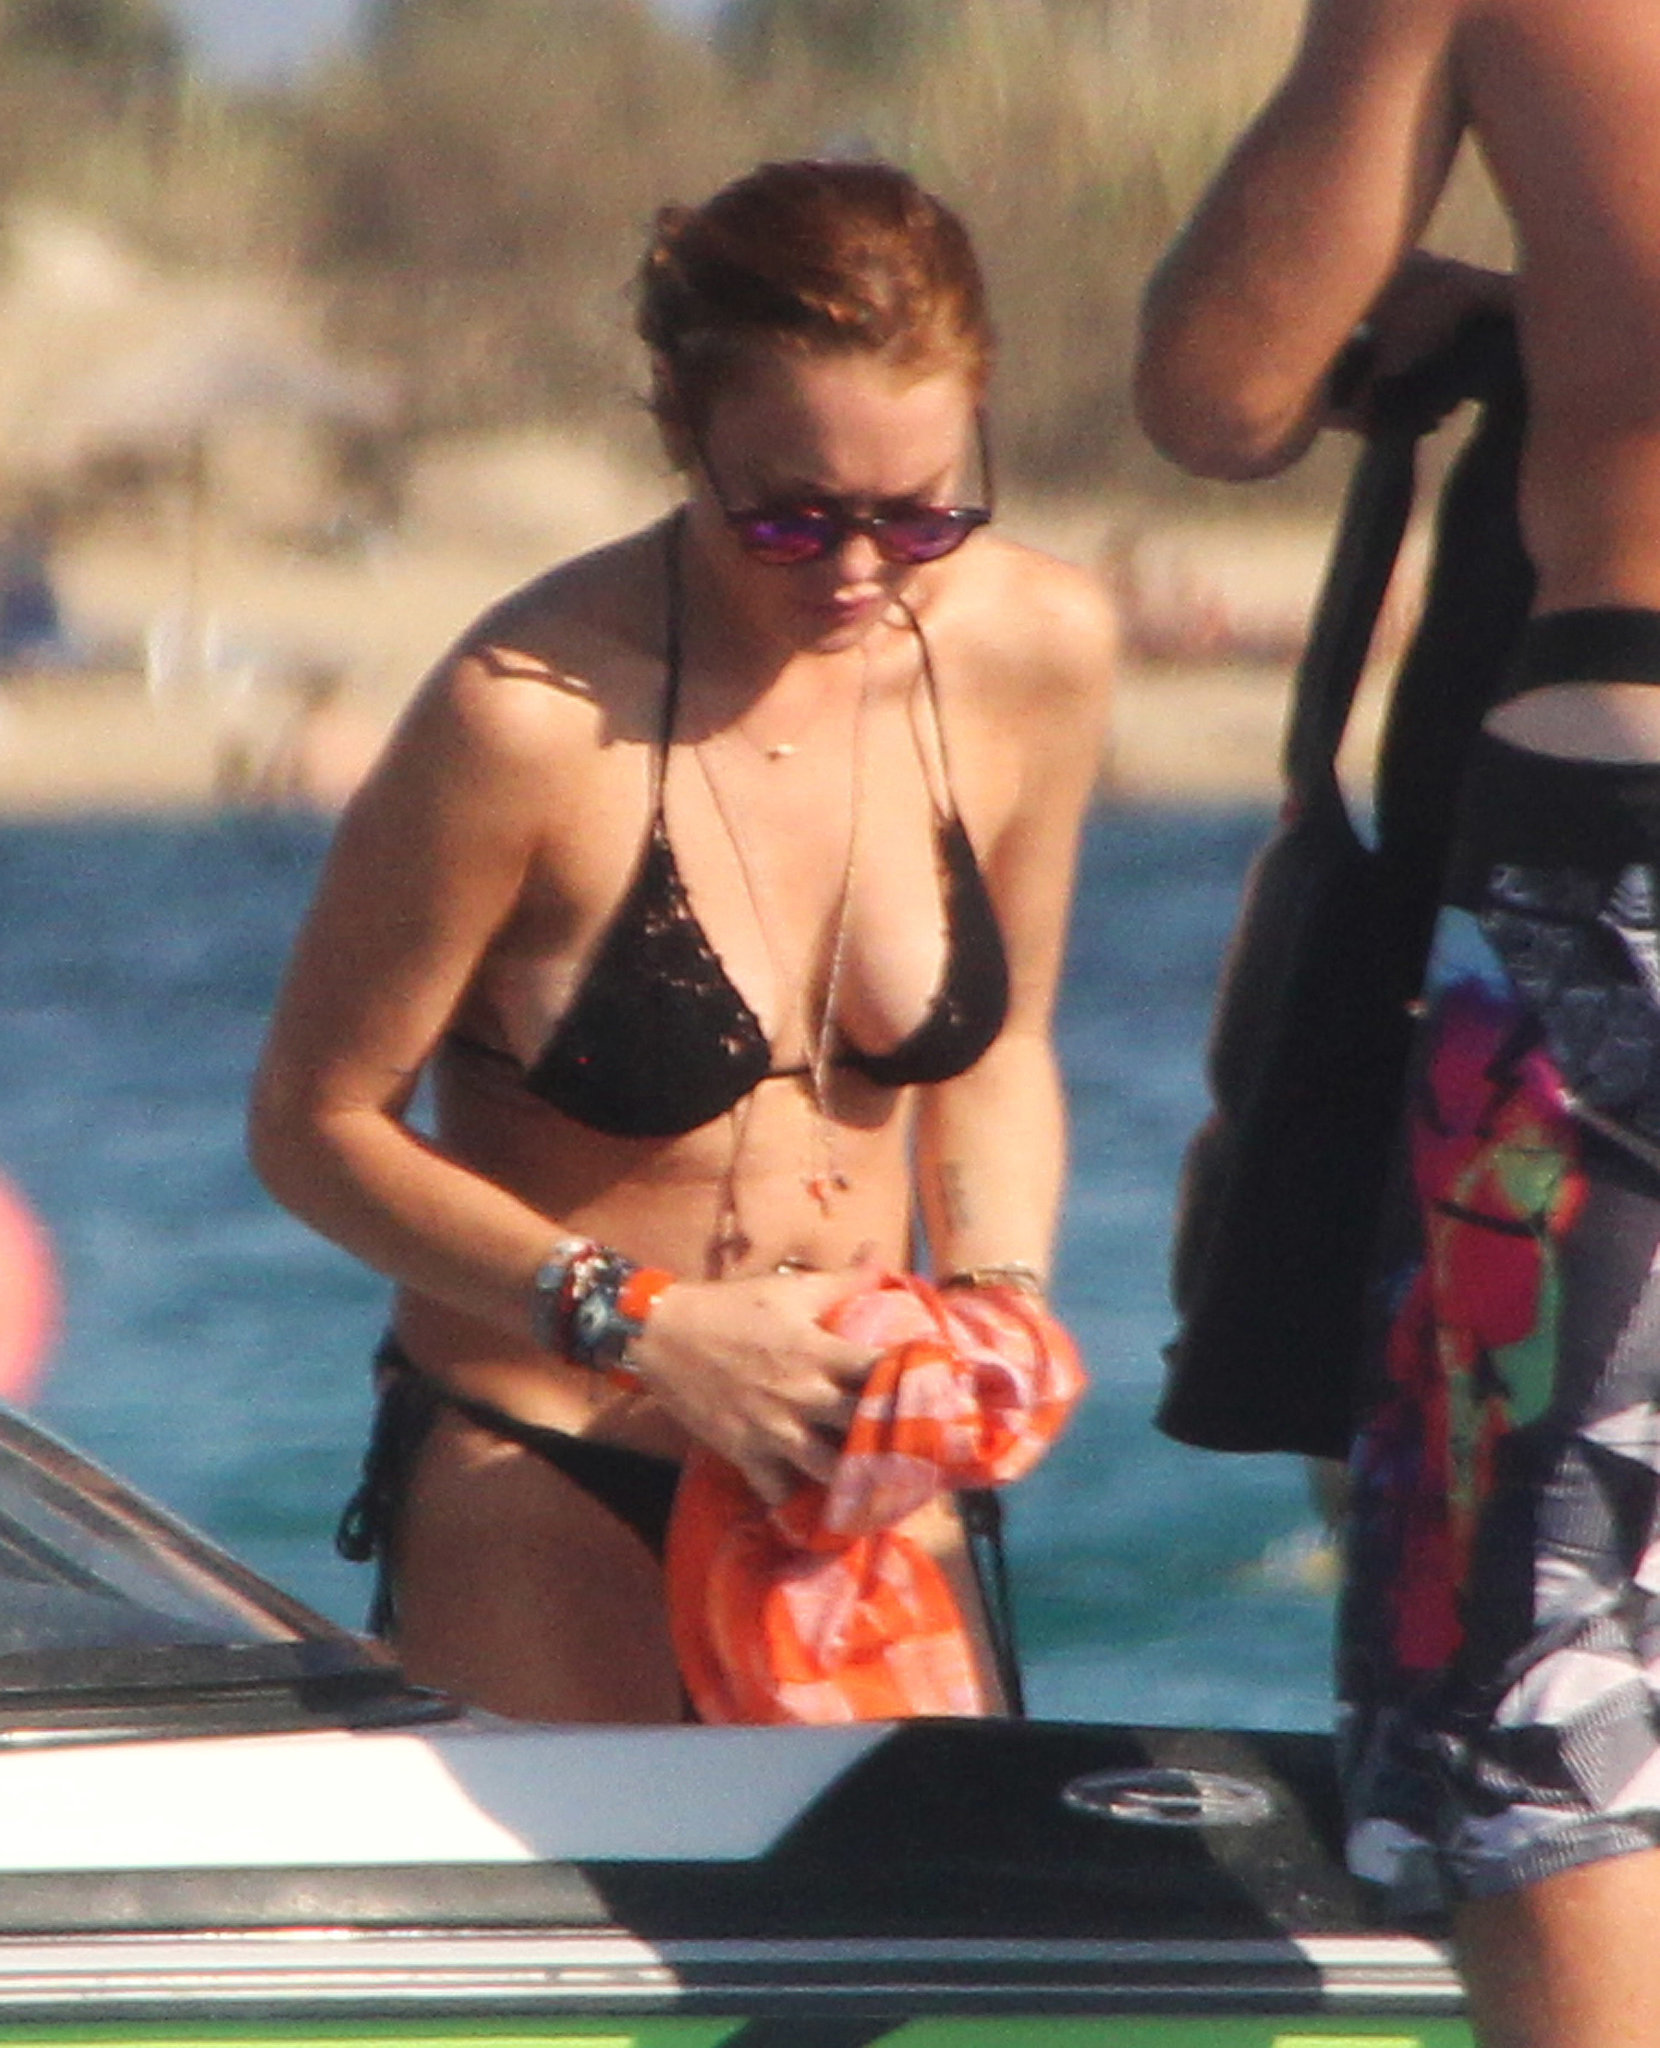 Lindsay Lohan's Latest Bikini Stop Hopefully Comes With Less Drama